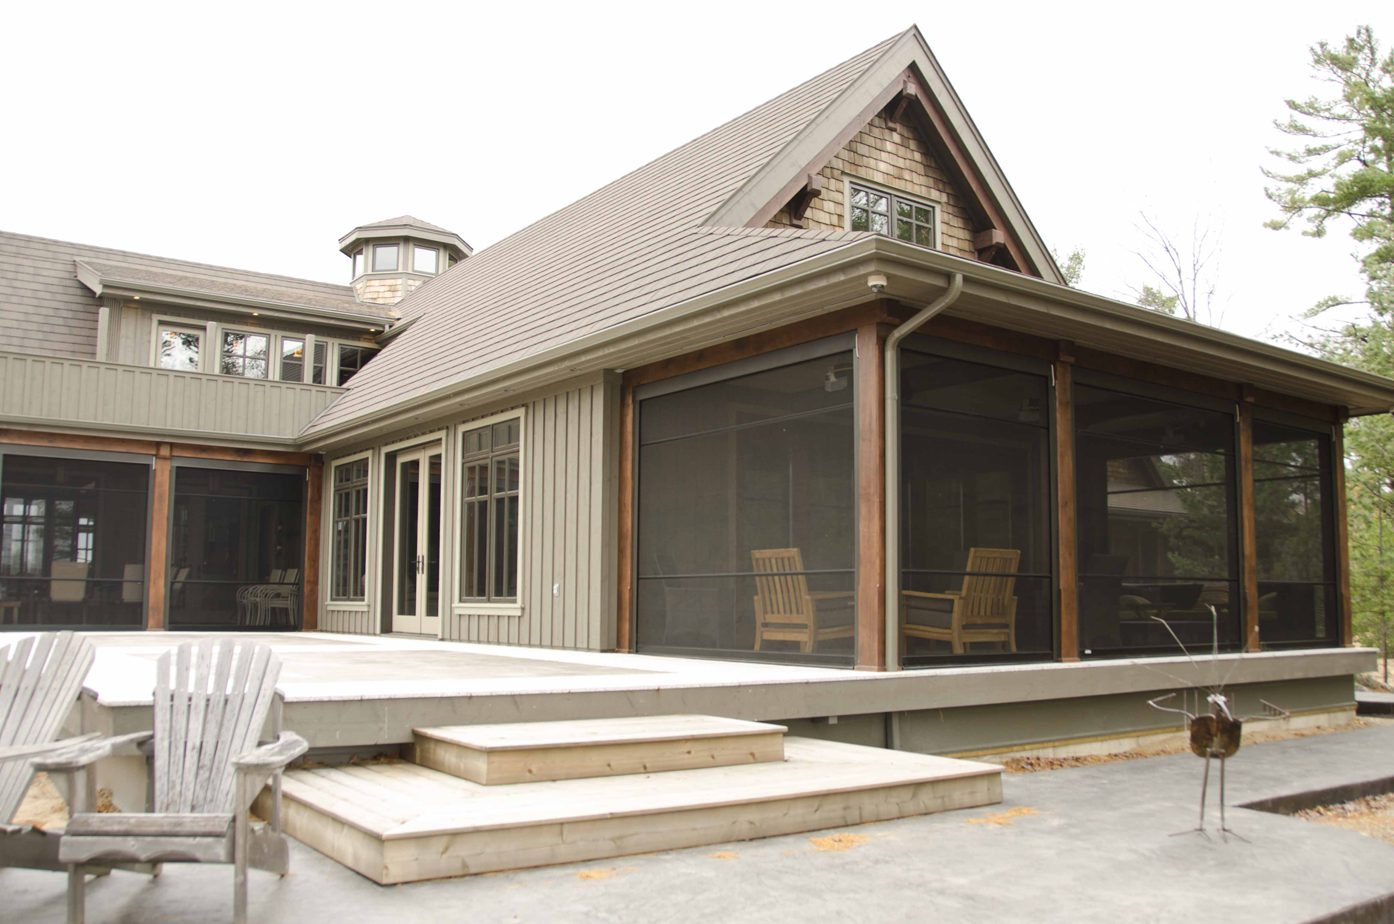 Normerica Timber Frame, Exterior, Cottage, Screen Porch, Backyard, Deck